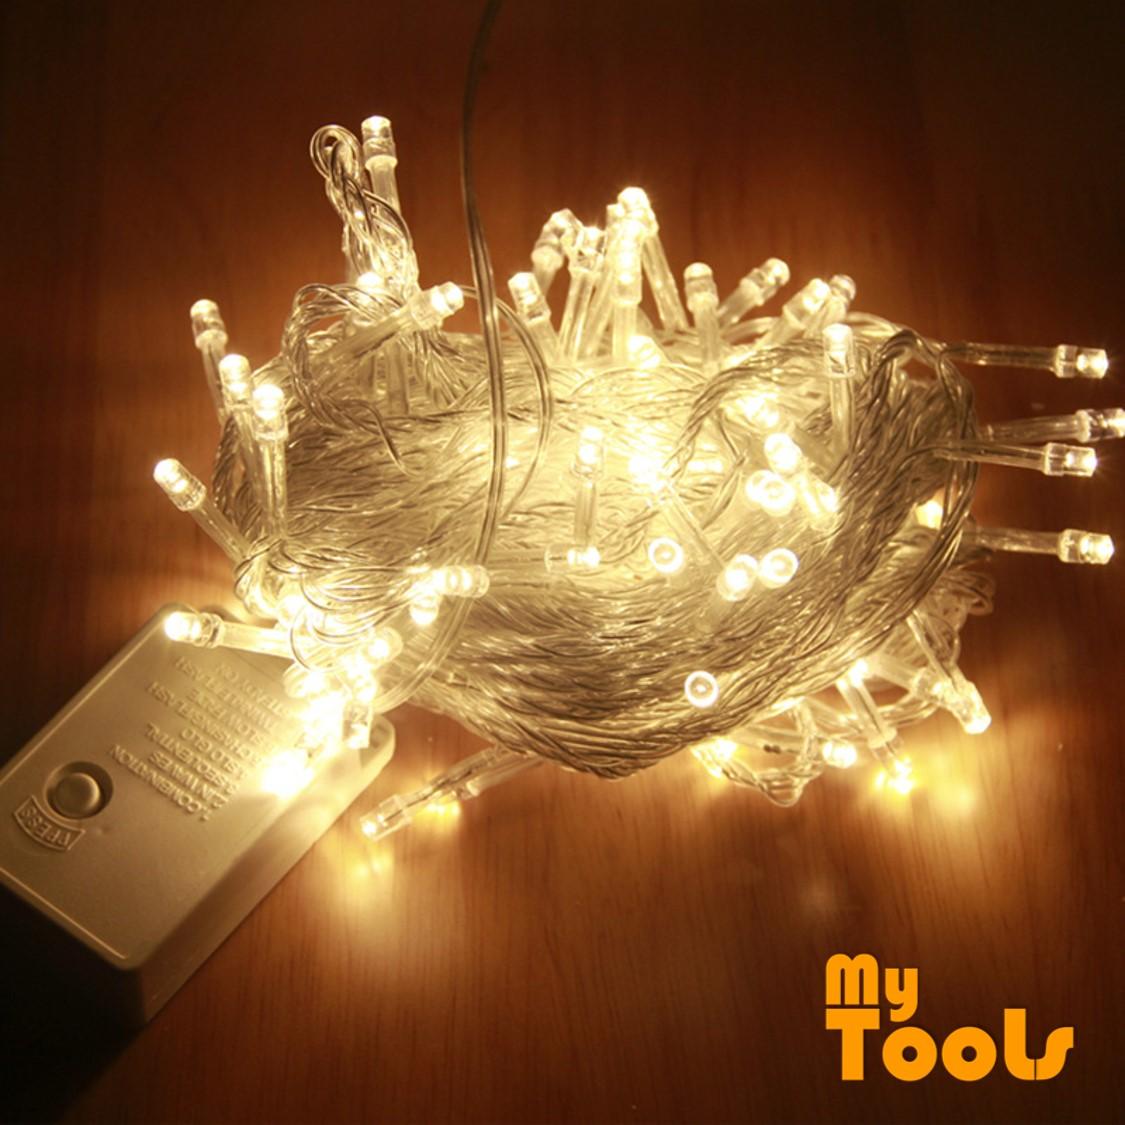 Mytools 10m 100 pcs LED fairy Light (Warm White) String Light Lamp Wedding Party lampu Home Festive Decorative strip lighting display